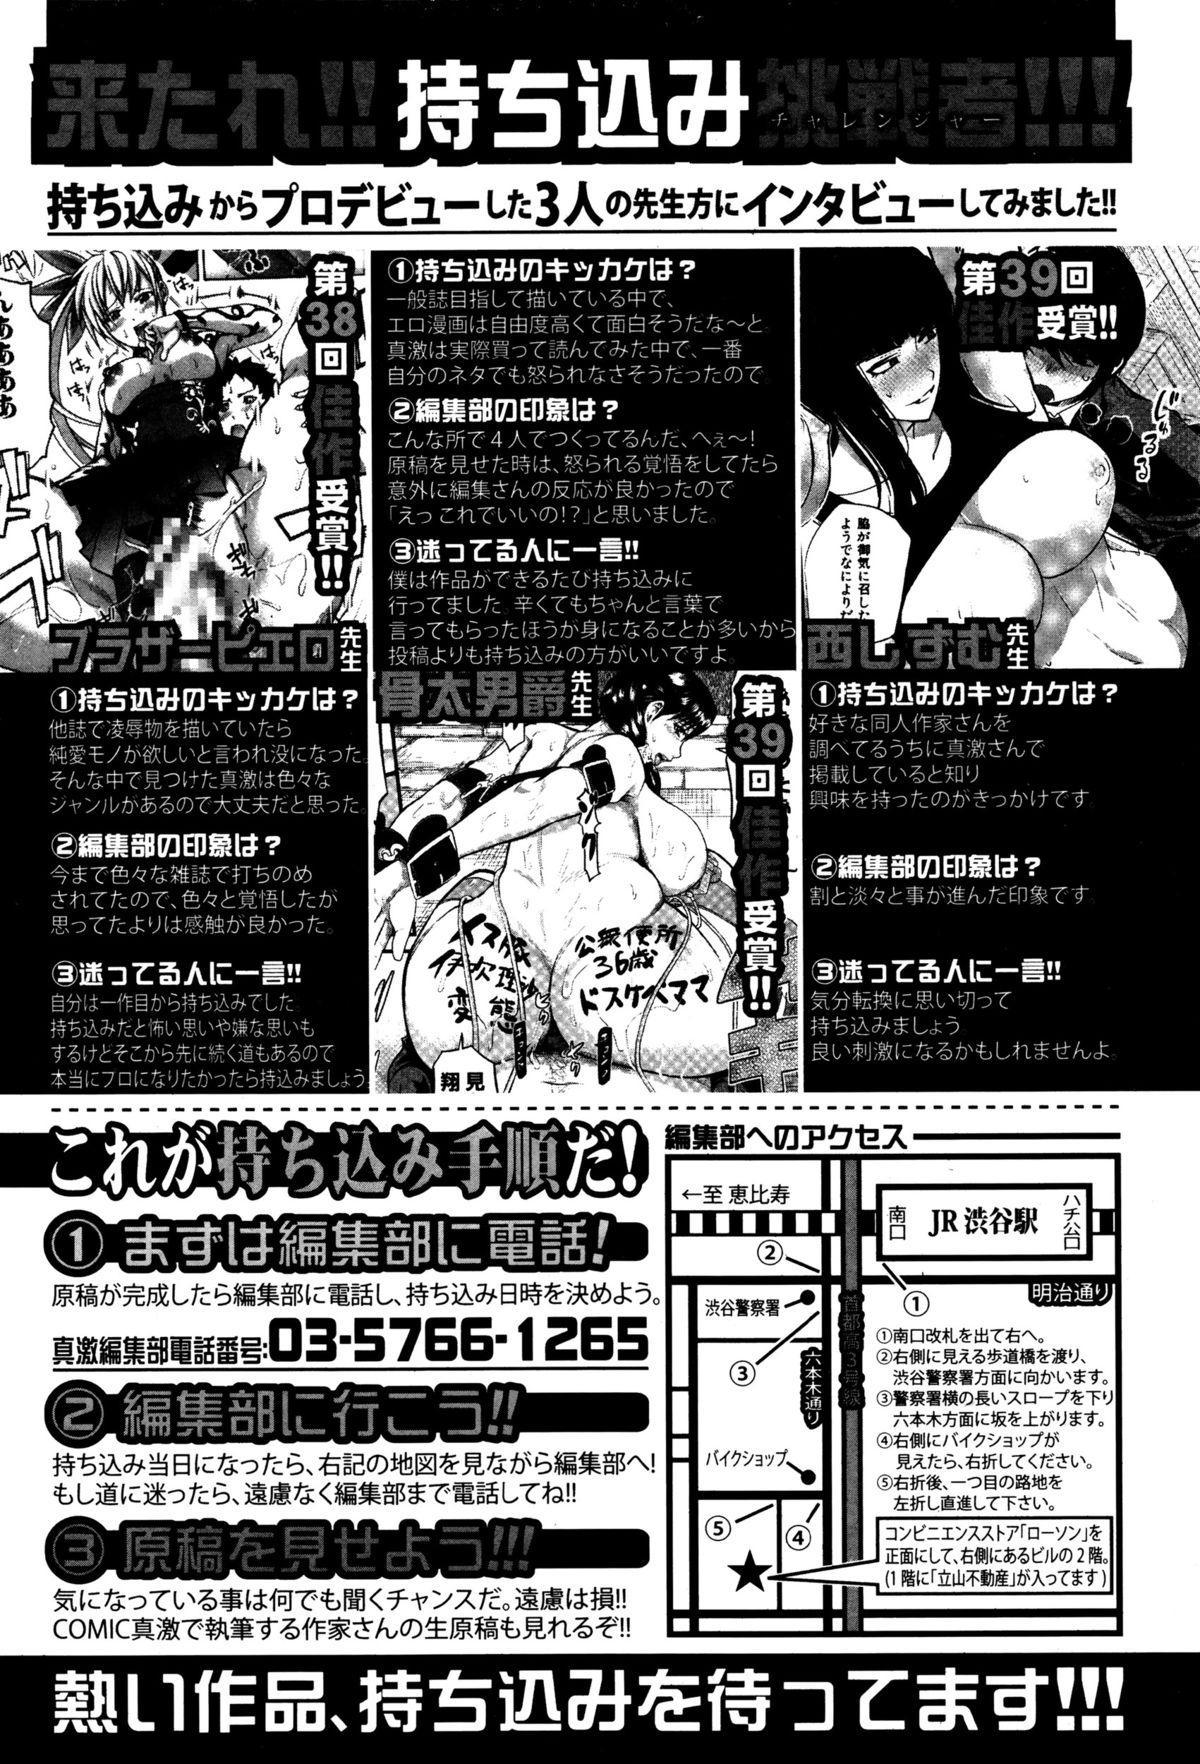 COMIC Shingeki 2016-01 333